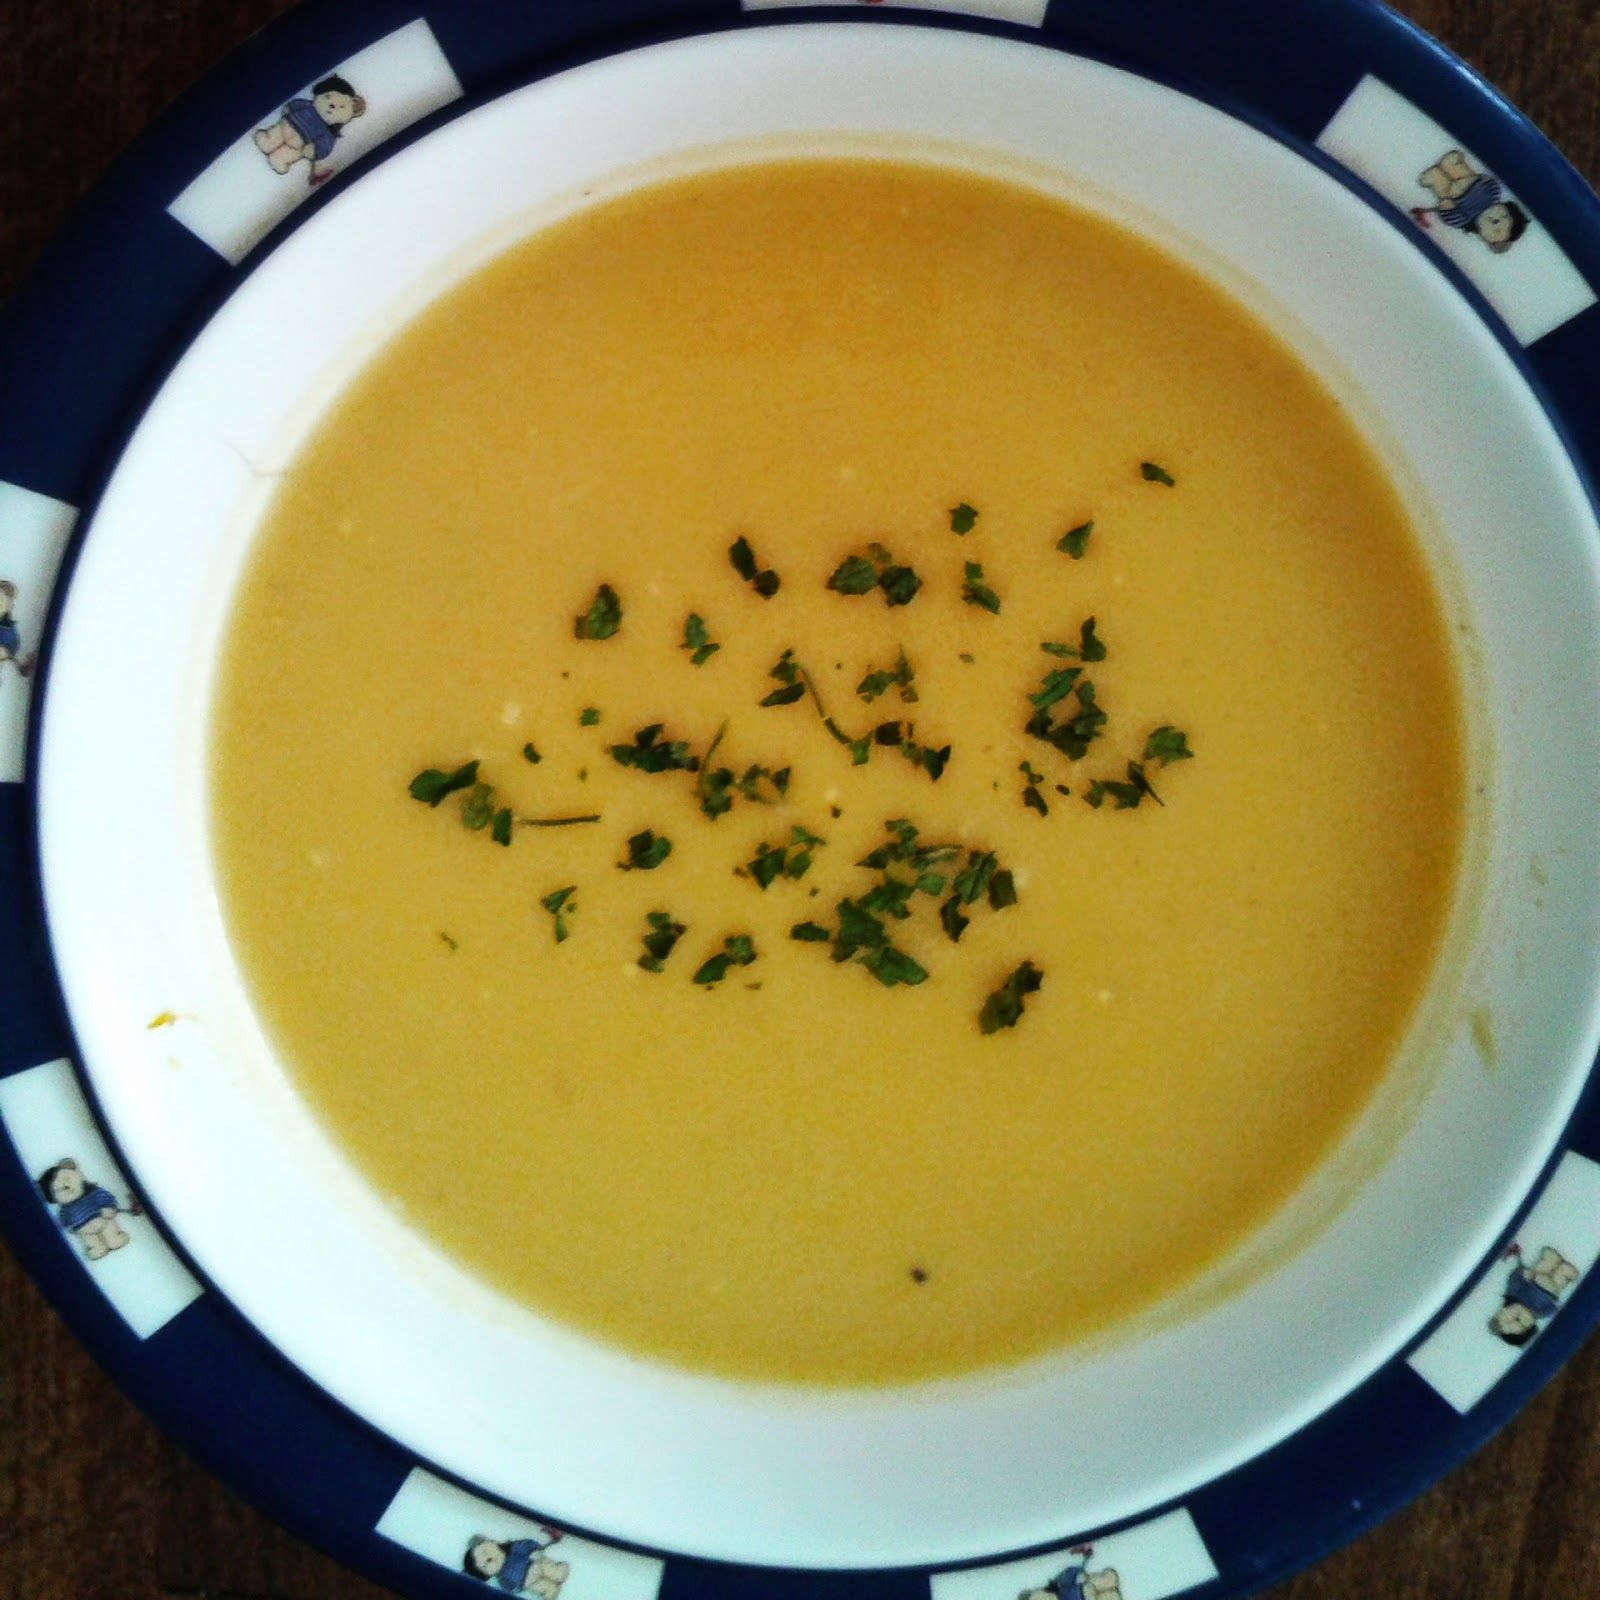 Healthy Breakfast Pumpkin Soup Recipe Resepi Sup Labu Ala Barat Untuk Sarapan Sihat Pumpkin Soup Soup Recipes